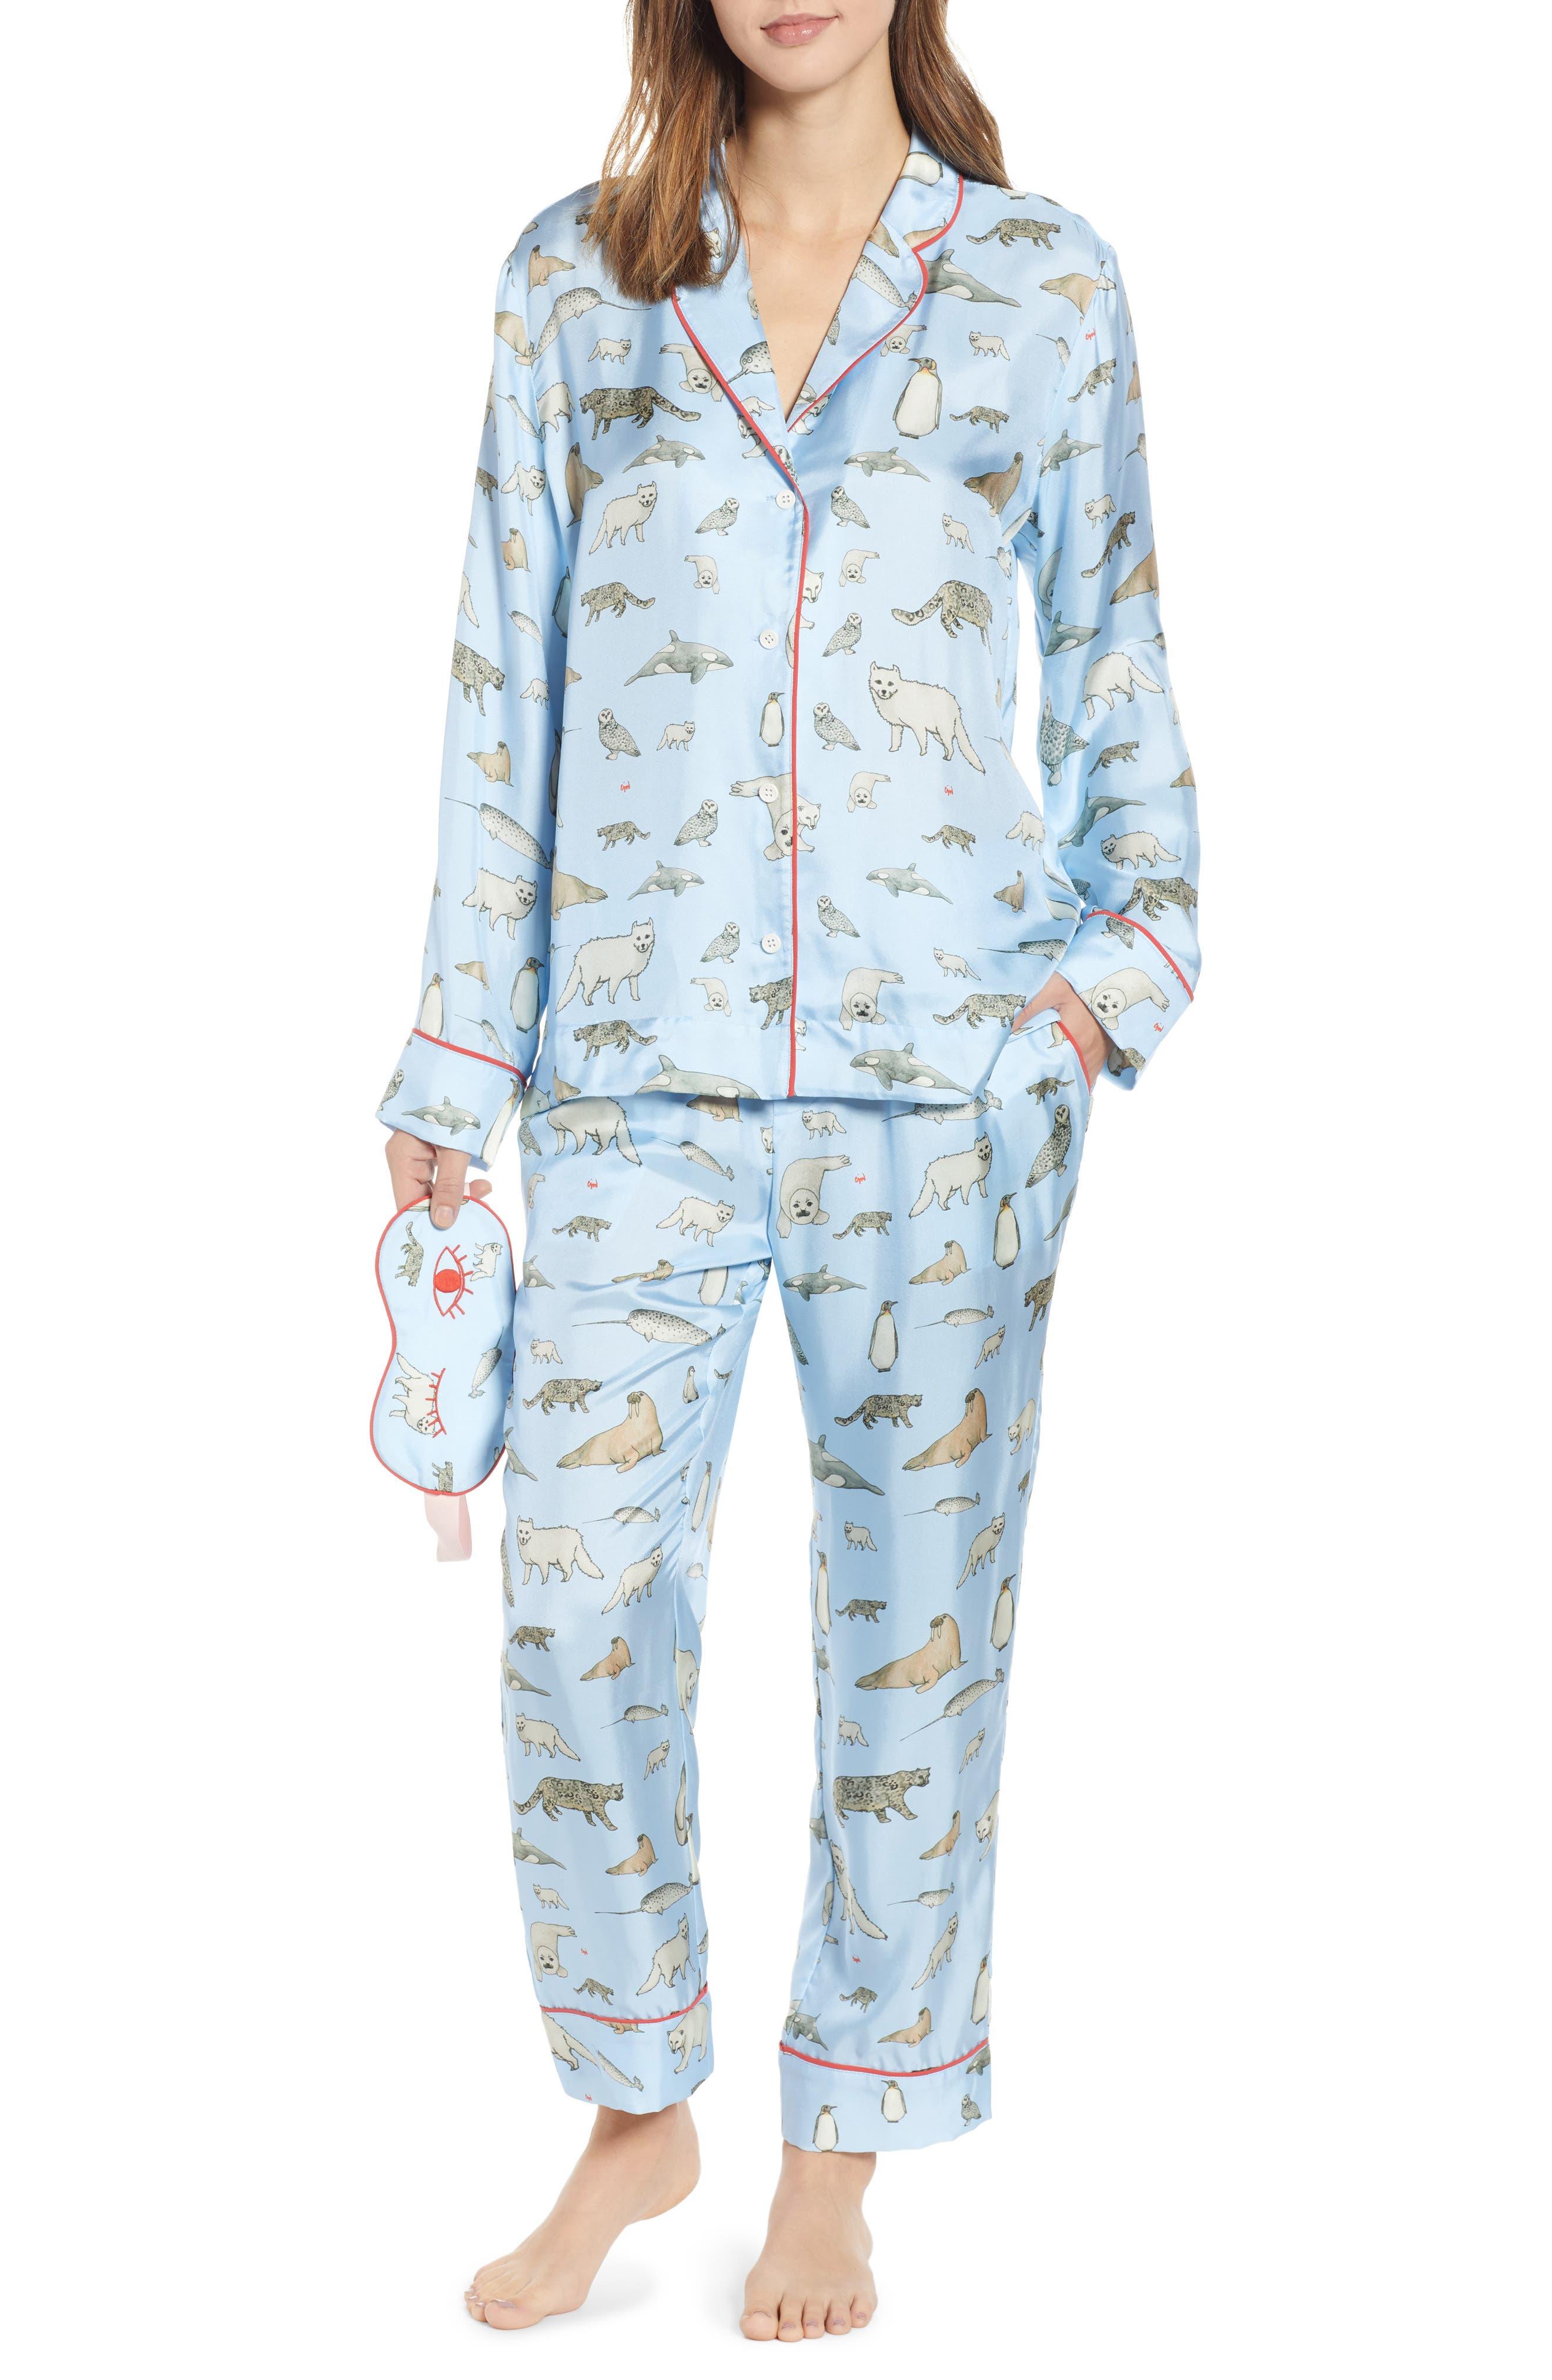 Winter Animals Pajamas & Eye Mask,                             Main thumbnail 1, color,                             LIGHT BLUE